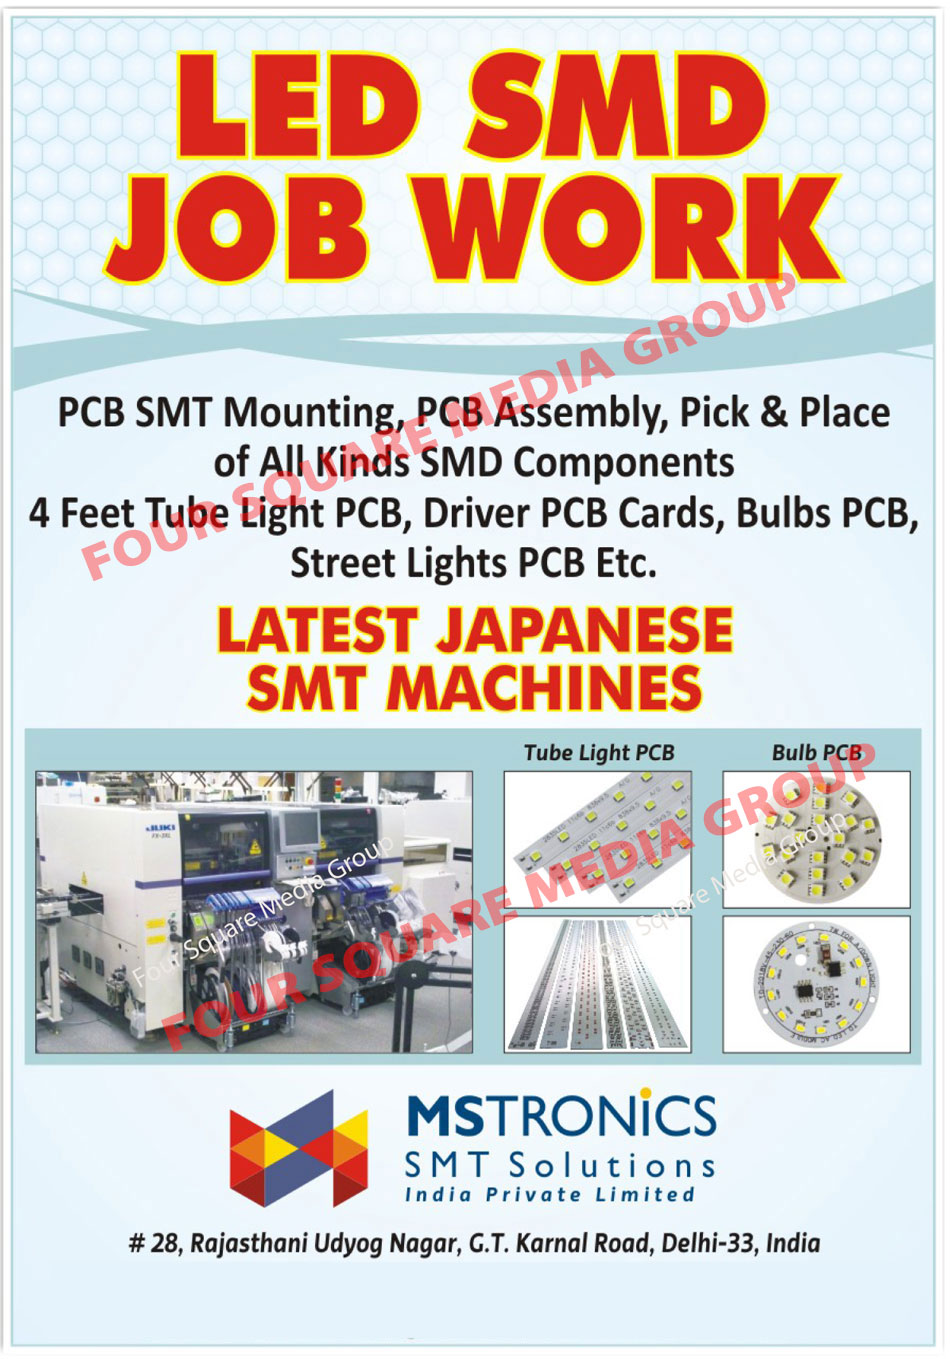 Led SMD Job Works, PCB SMT Mounting, PCB Assembly, SMD Component Pick Place Service, 4 Feet Tube Light PCB, Driver PCB Cards, Bulb PCB, Street Light PCB